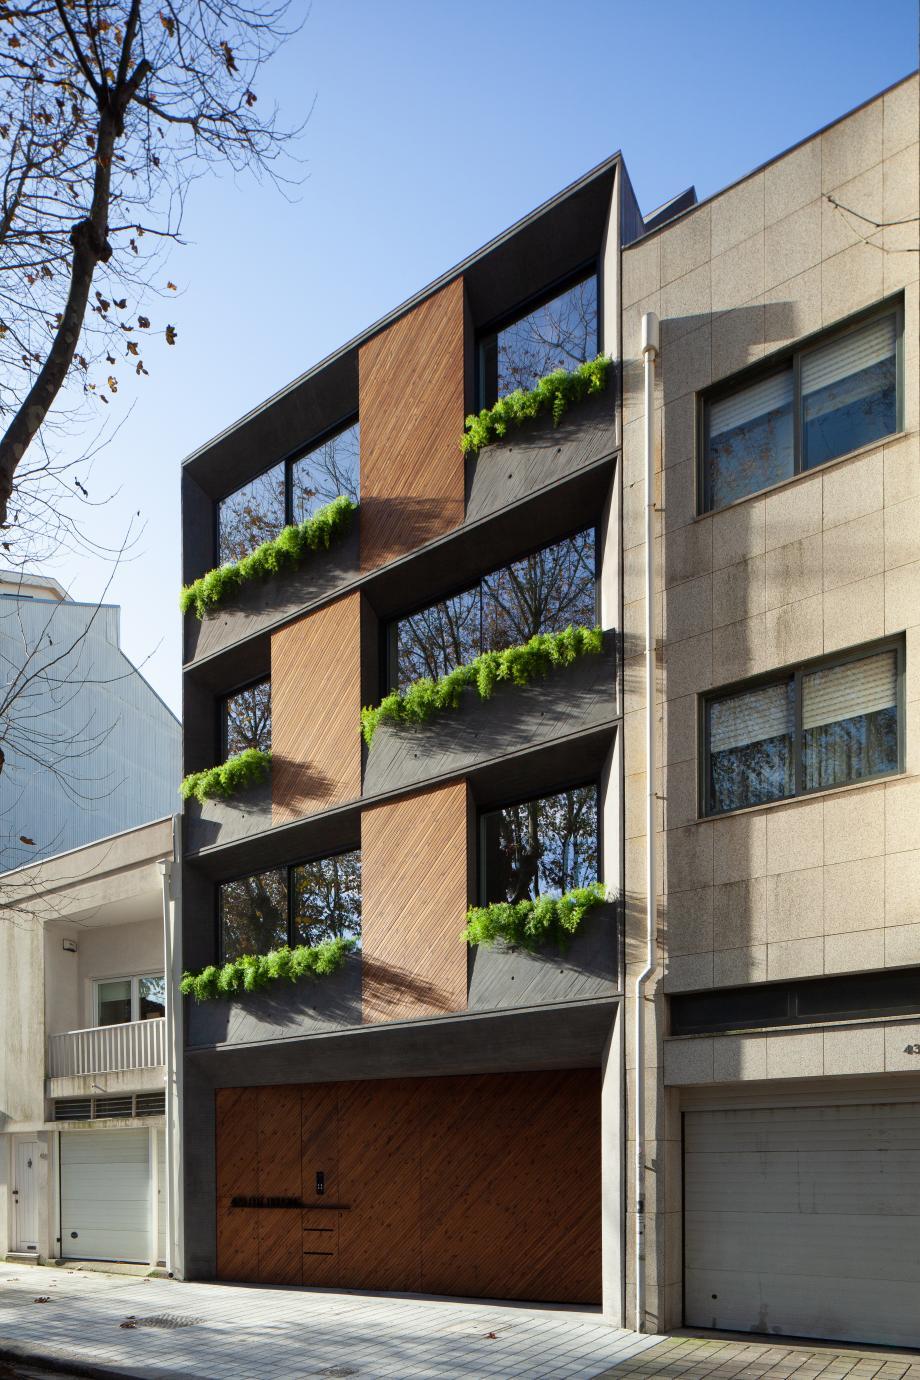 Architettura And Design porto's modern architecture is having a moment